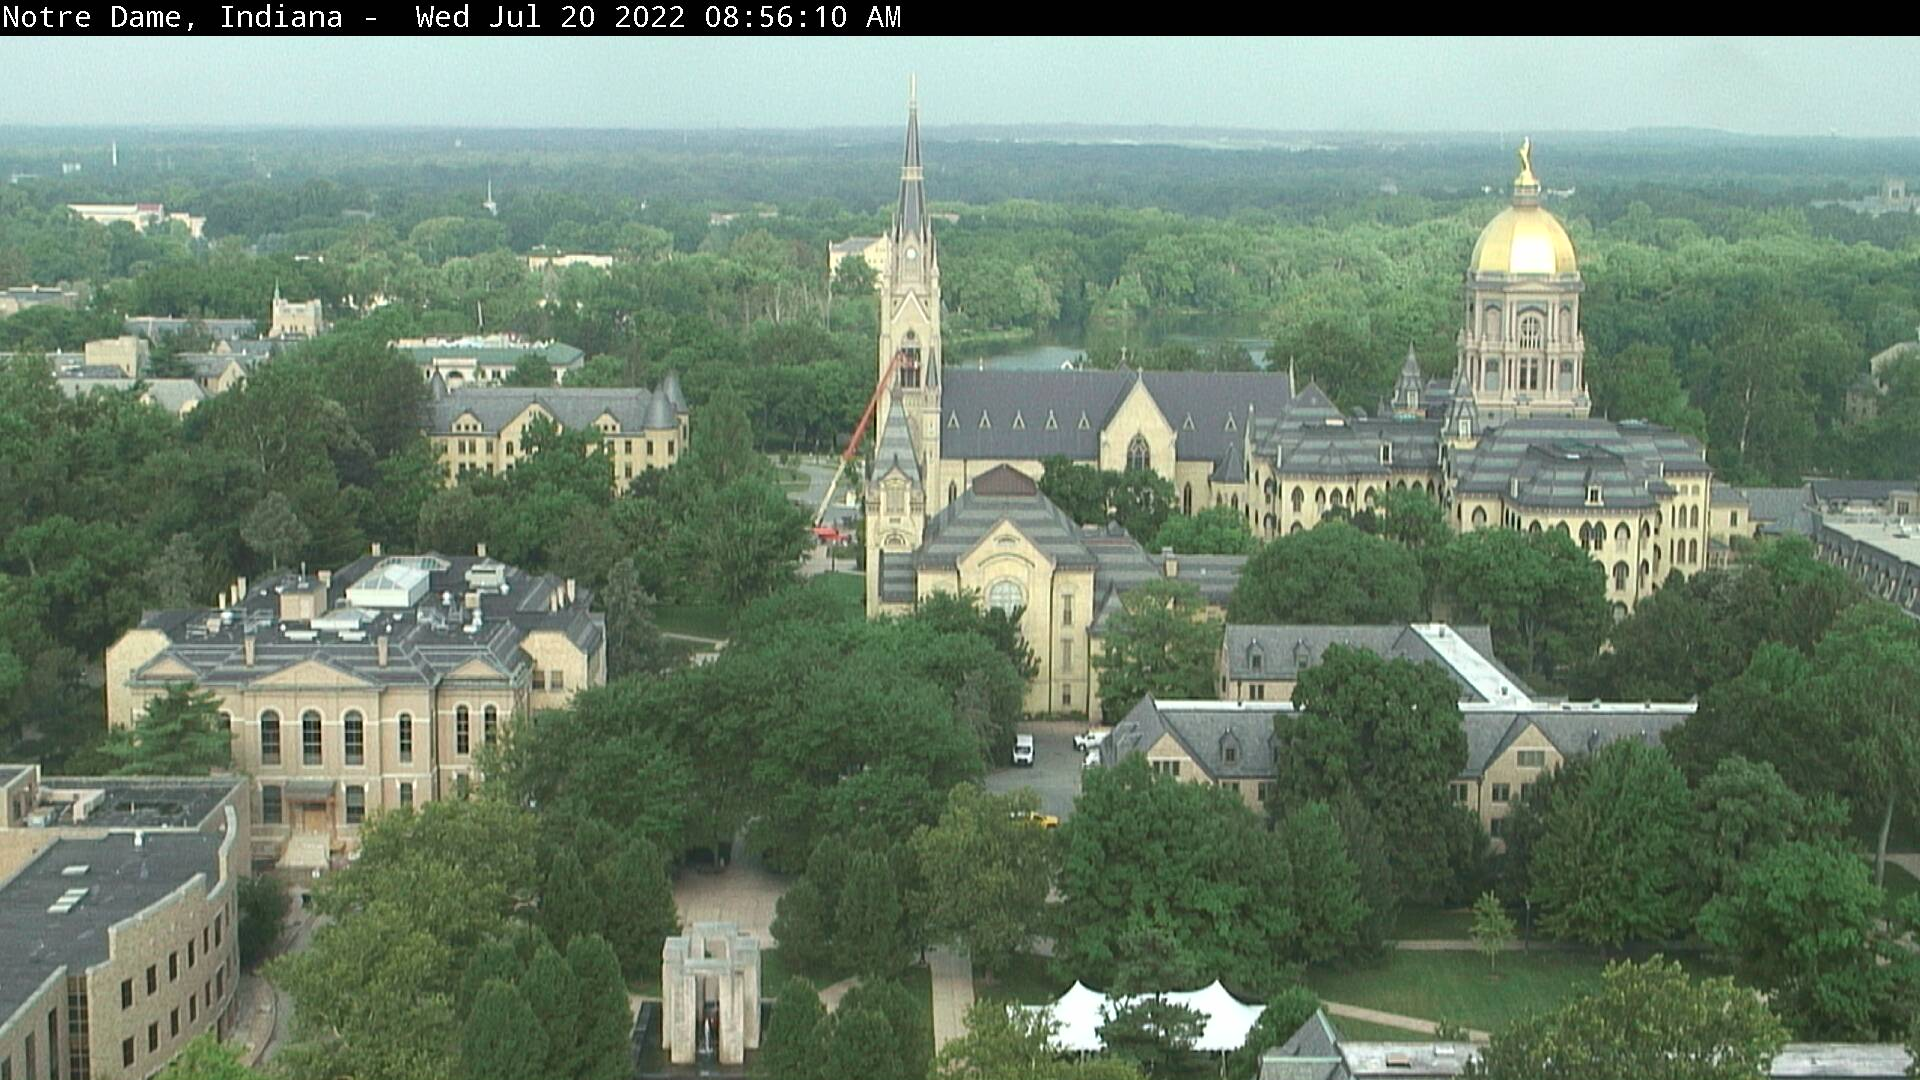 Notre Dame, Indiana Sat. 08:56